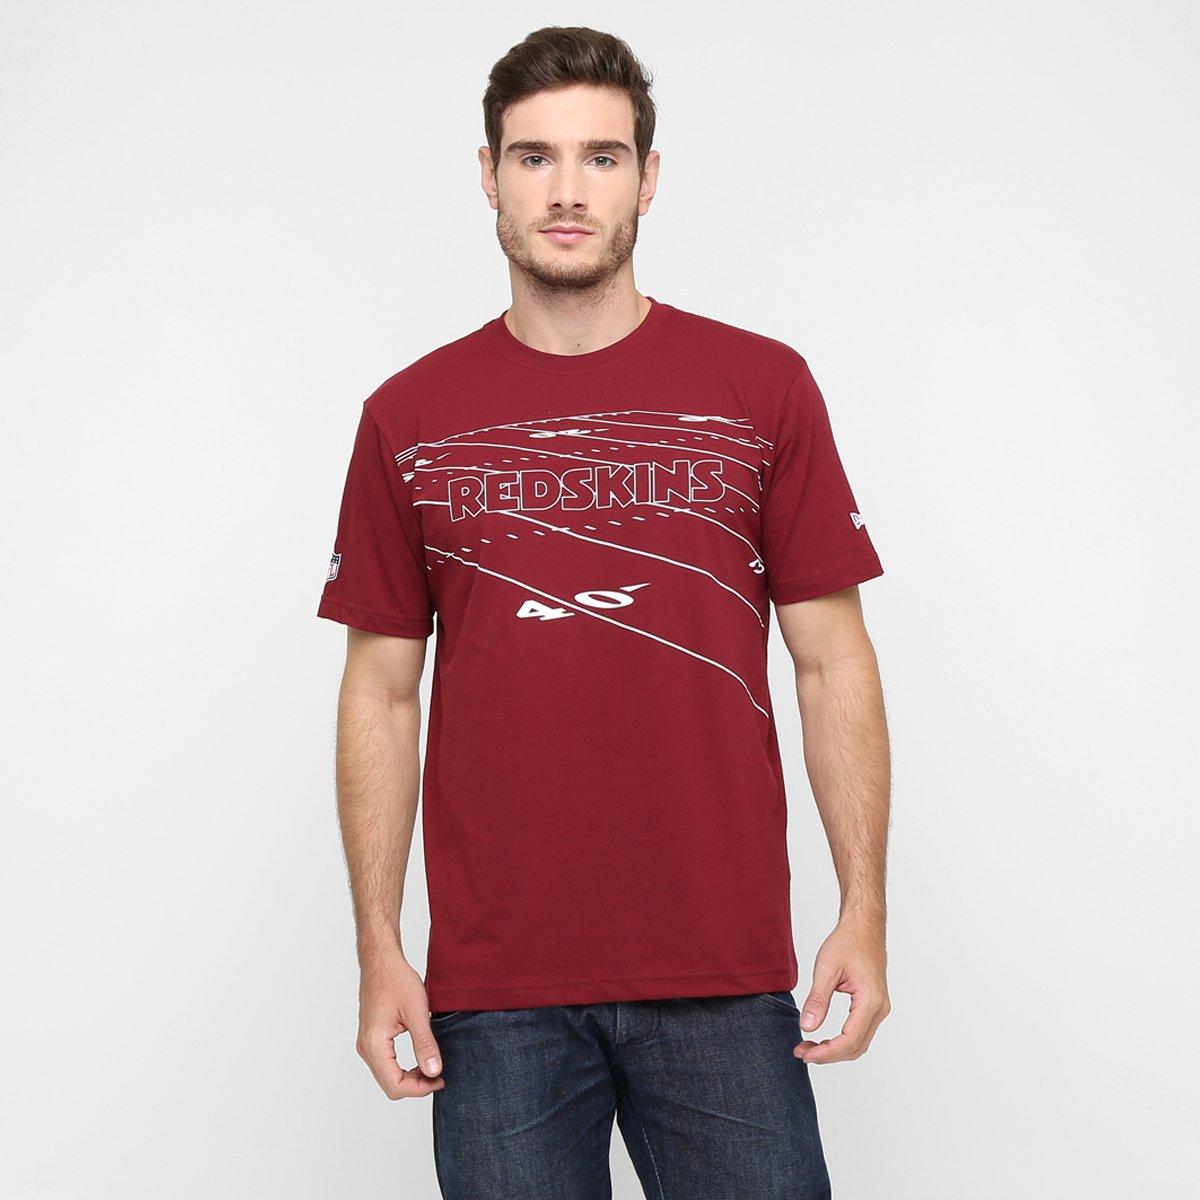 87388b9952 Camiseta New Era NFL Field Washington Redskins - Compre Agora